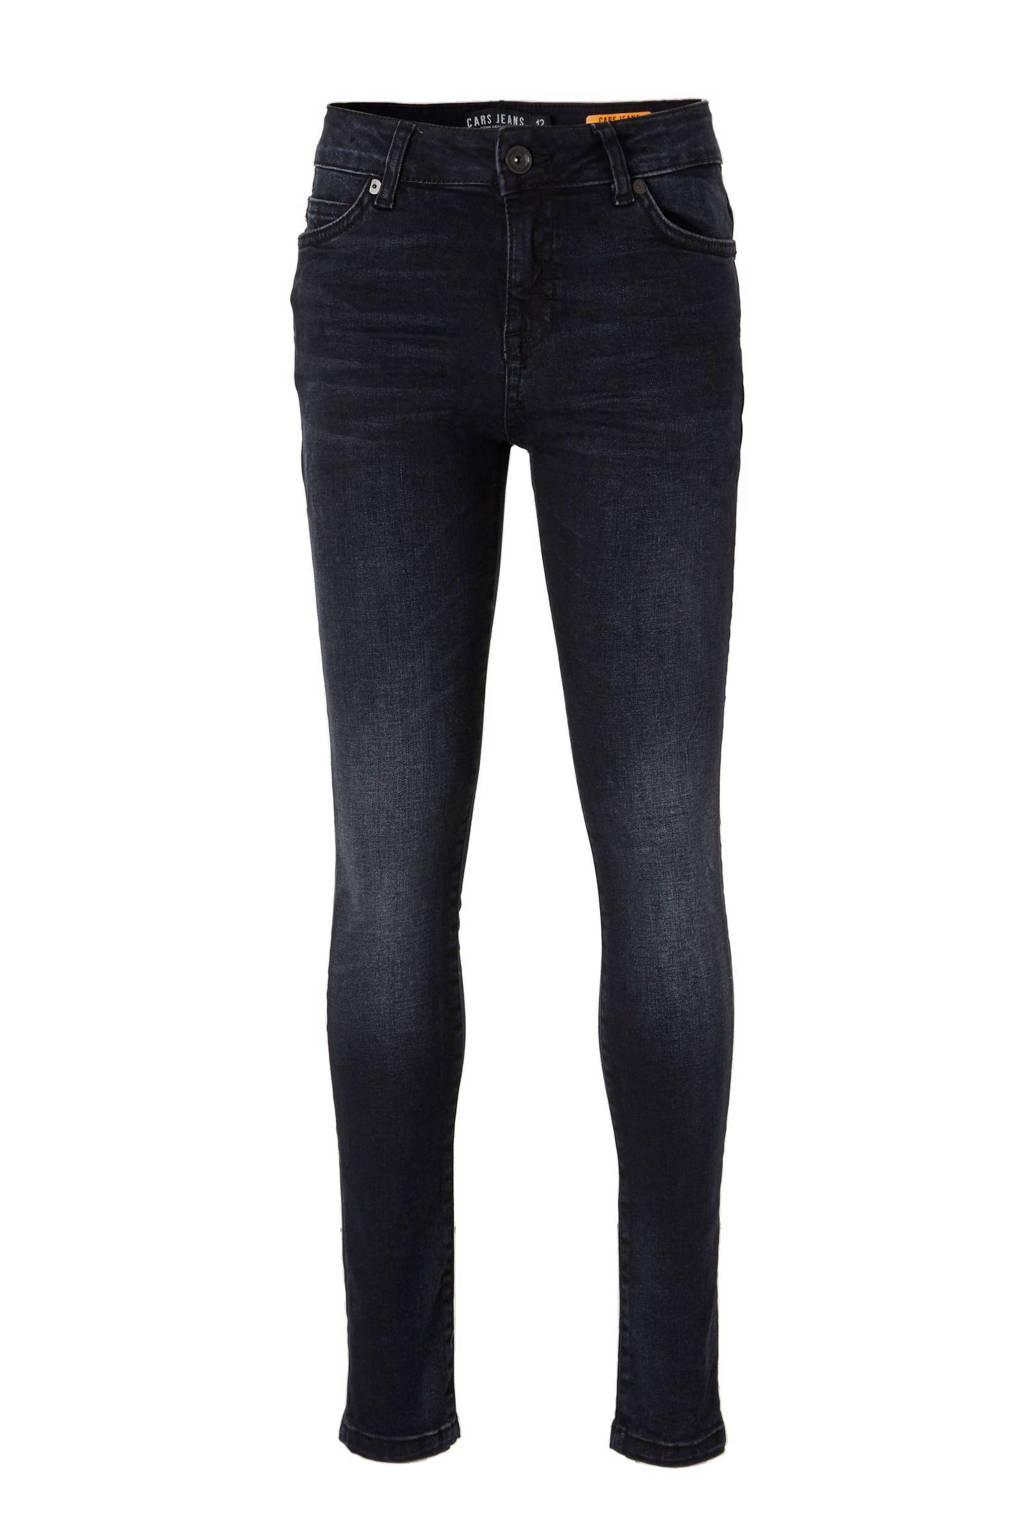 Cars Dust super skinny fit jeans, Blue black